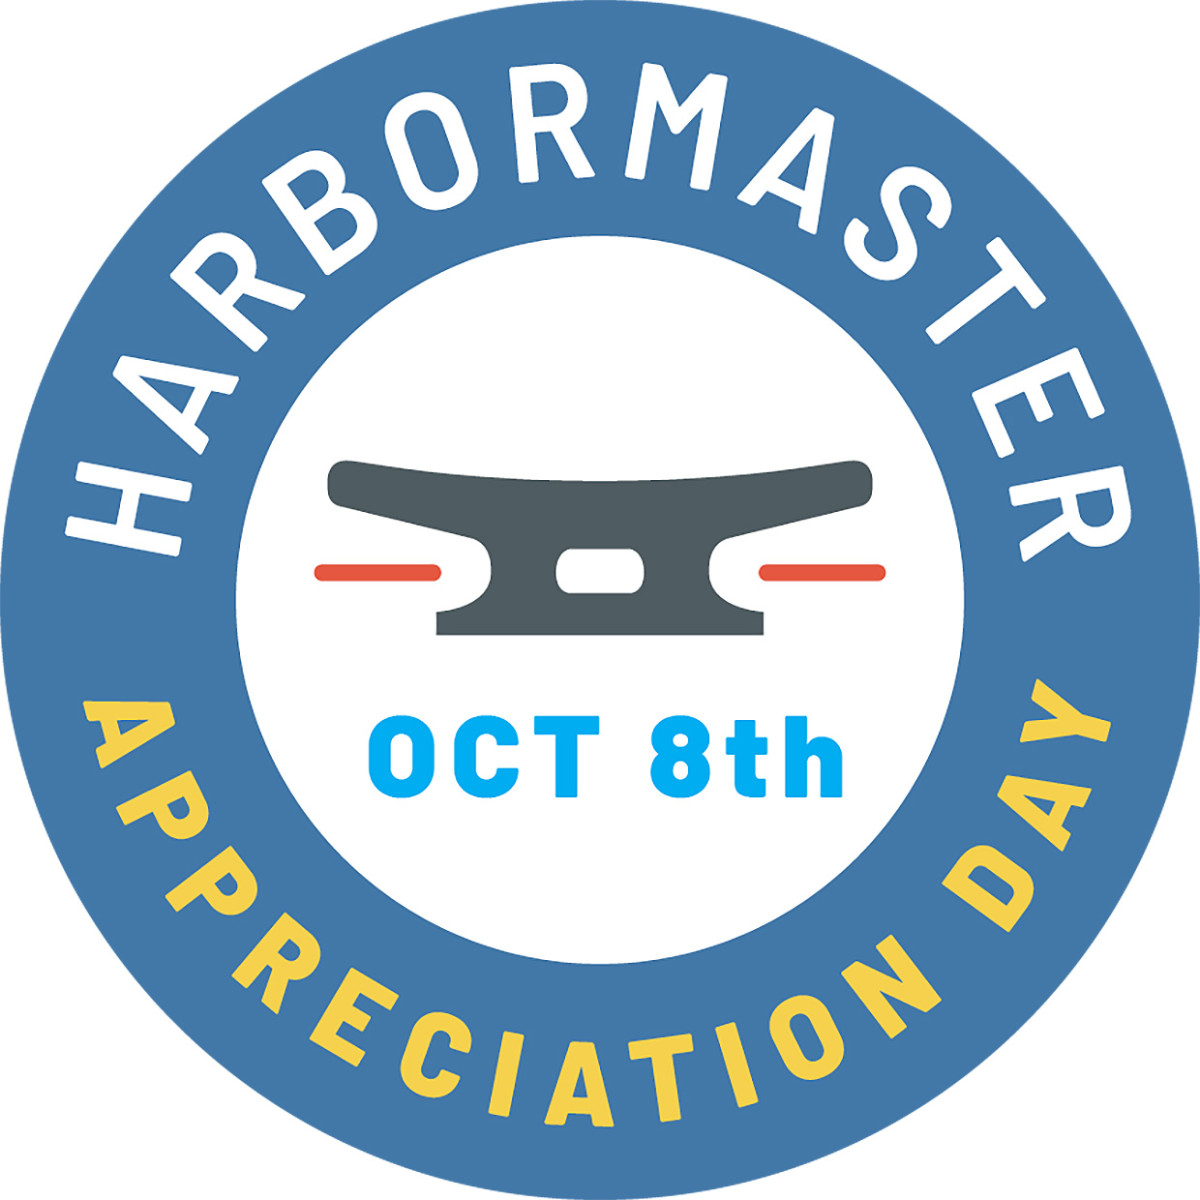 1_Harbormaster Day logo